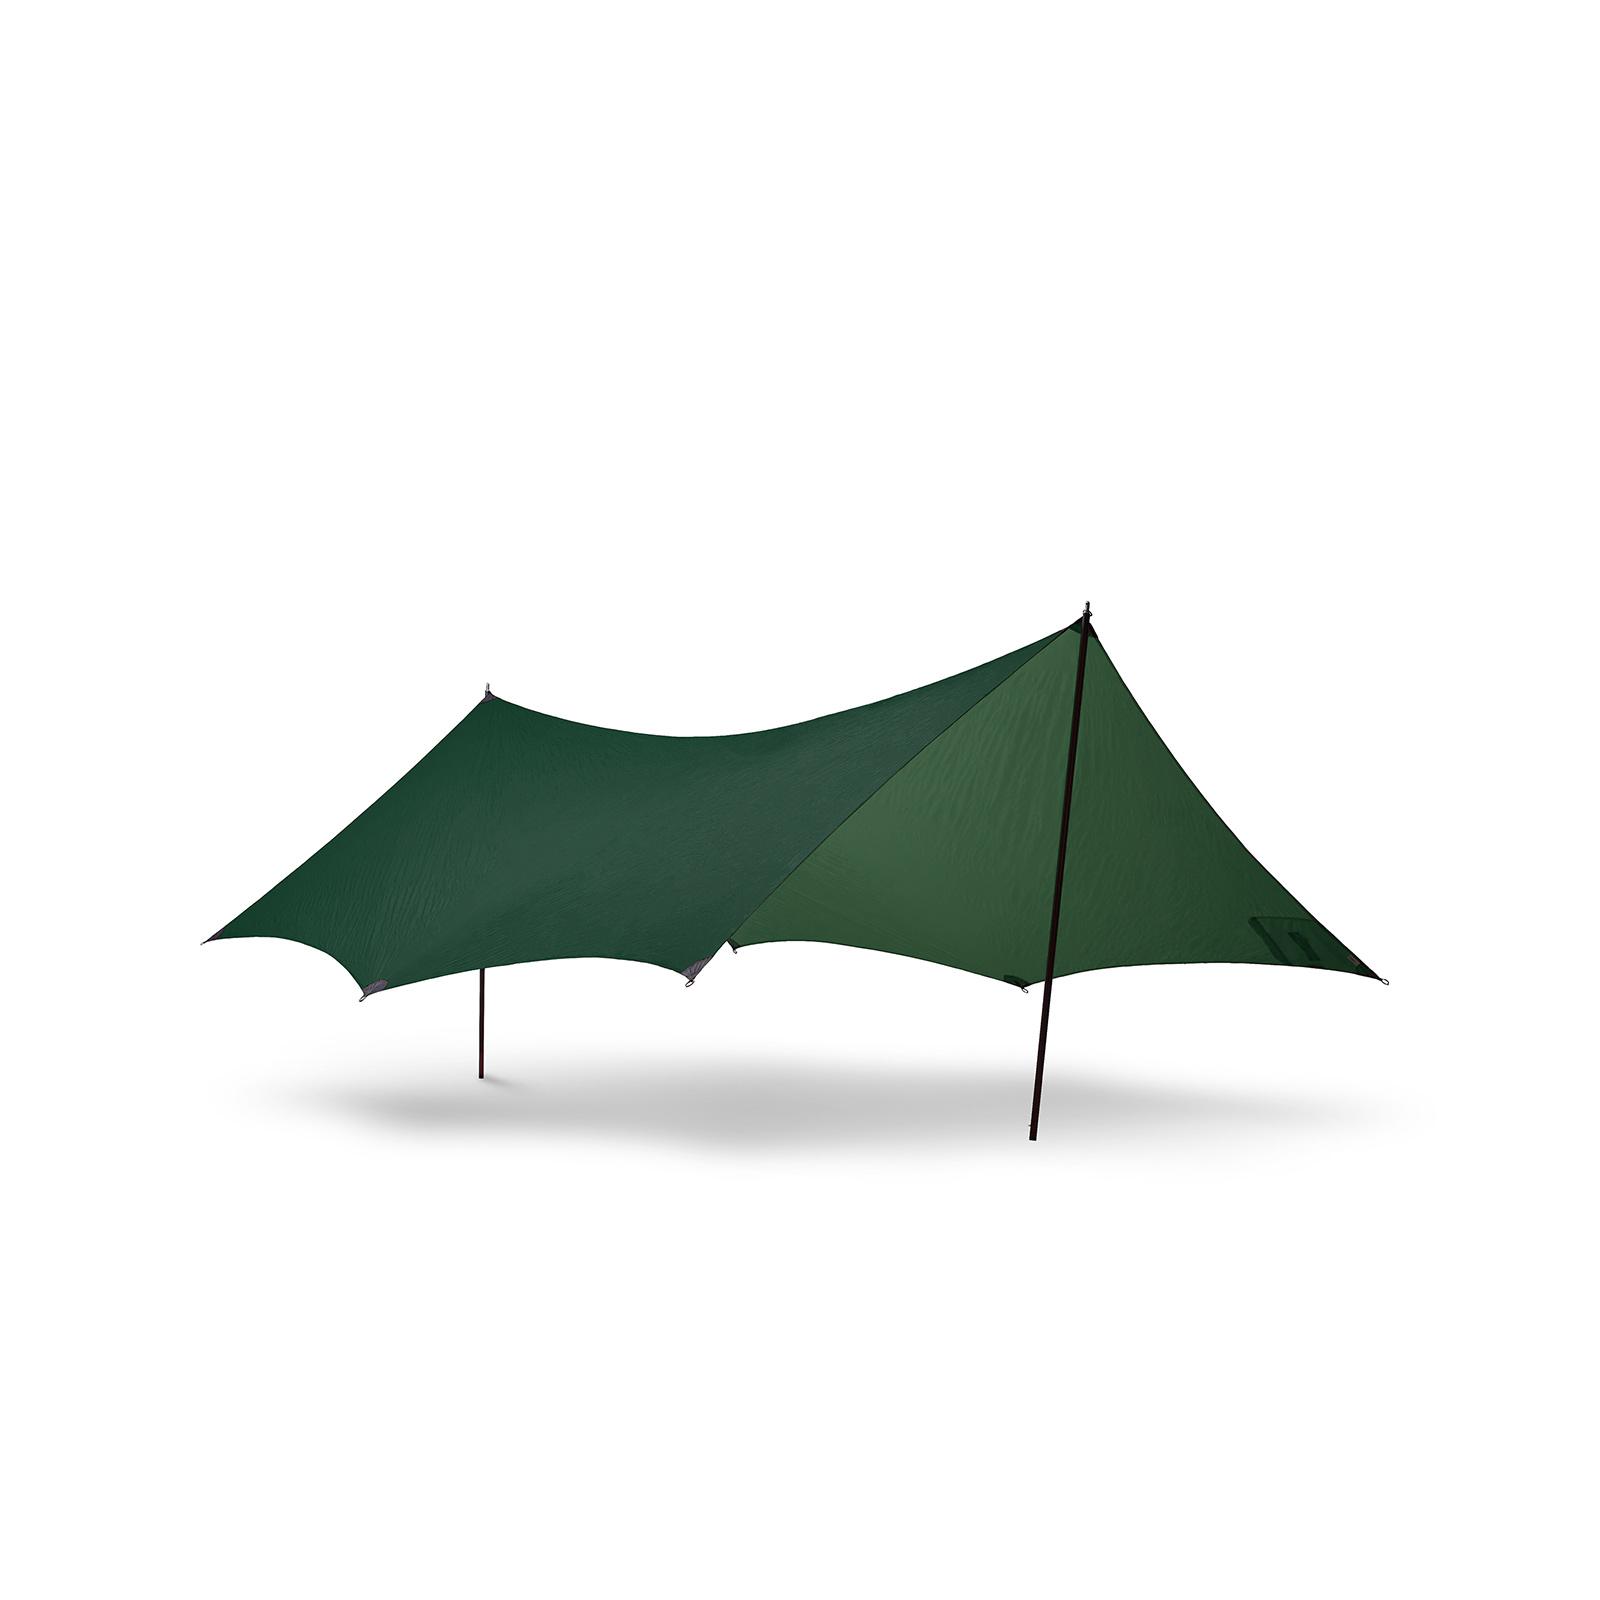 TARP10 UL GREEN / タープ10 UL (ウルトラライト) グリーン